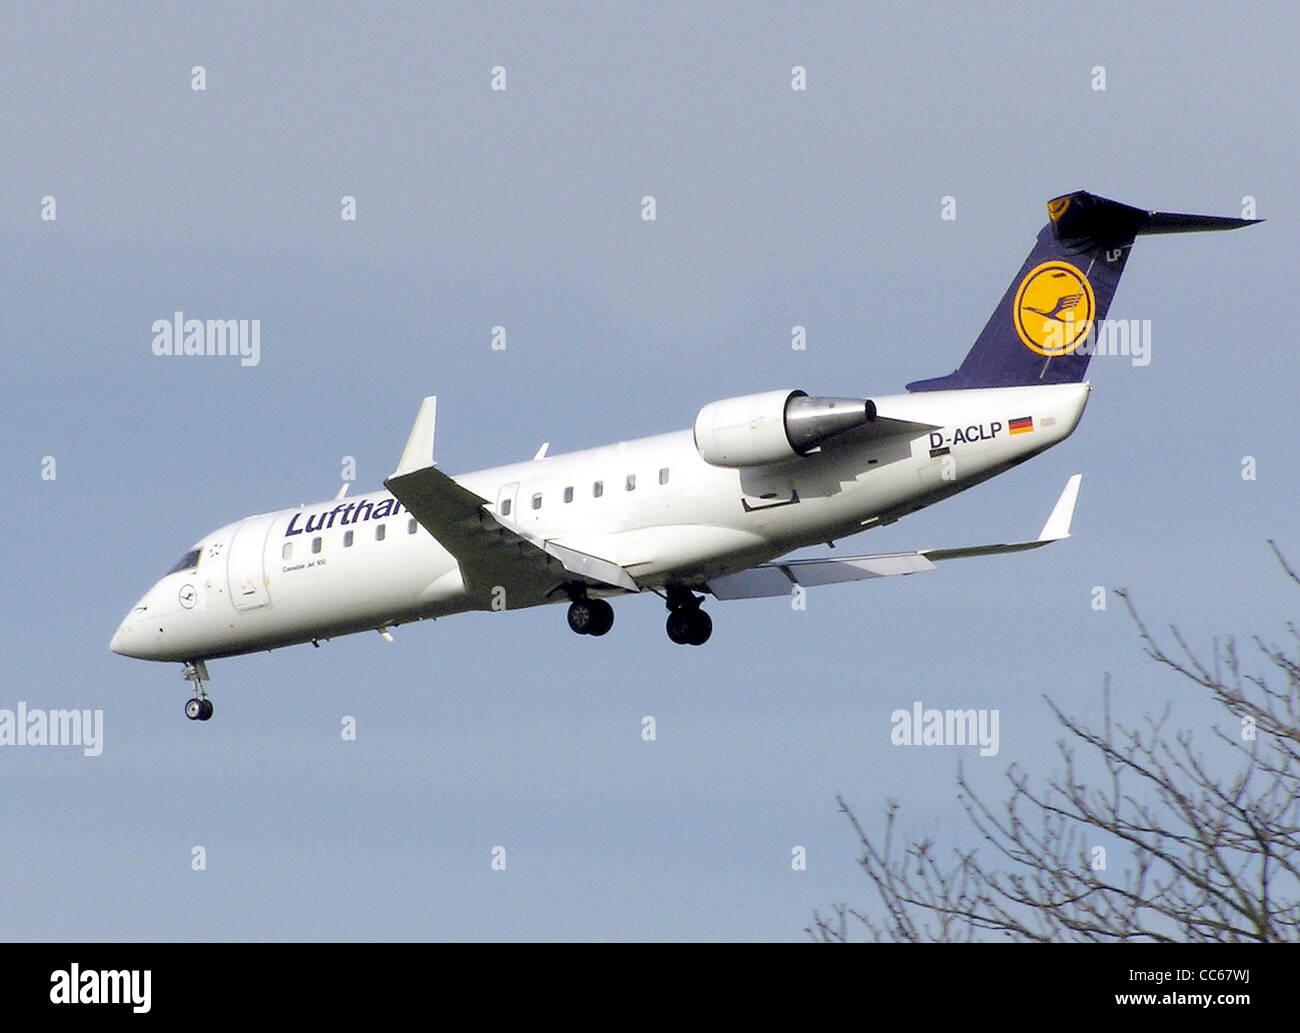 Lufthansa CityLine Canadair CL-600-2B19 regional jet (CRJ-100) (D-ACLP) landing at London Heathrow Airport, England. - Stock Image